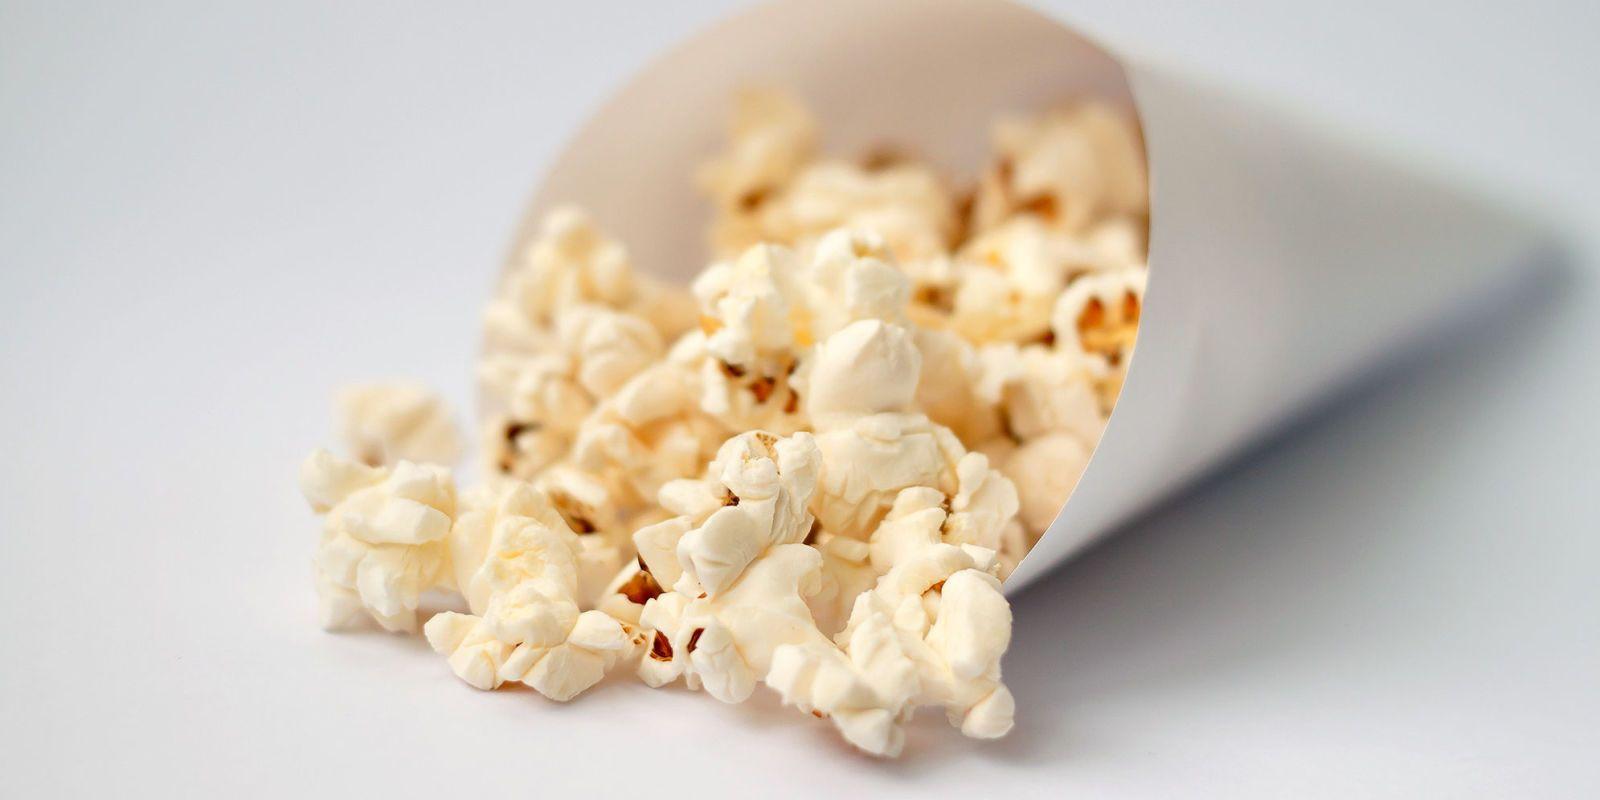 carbohidratos buenos para perder peso